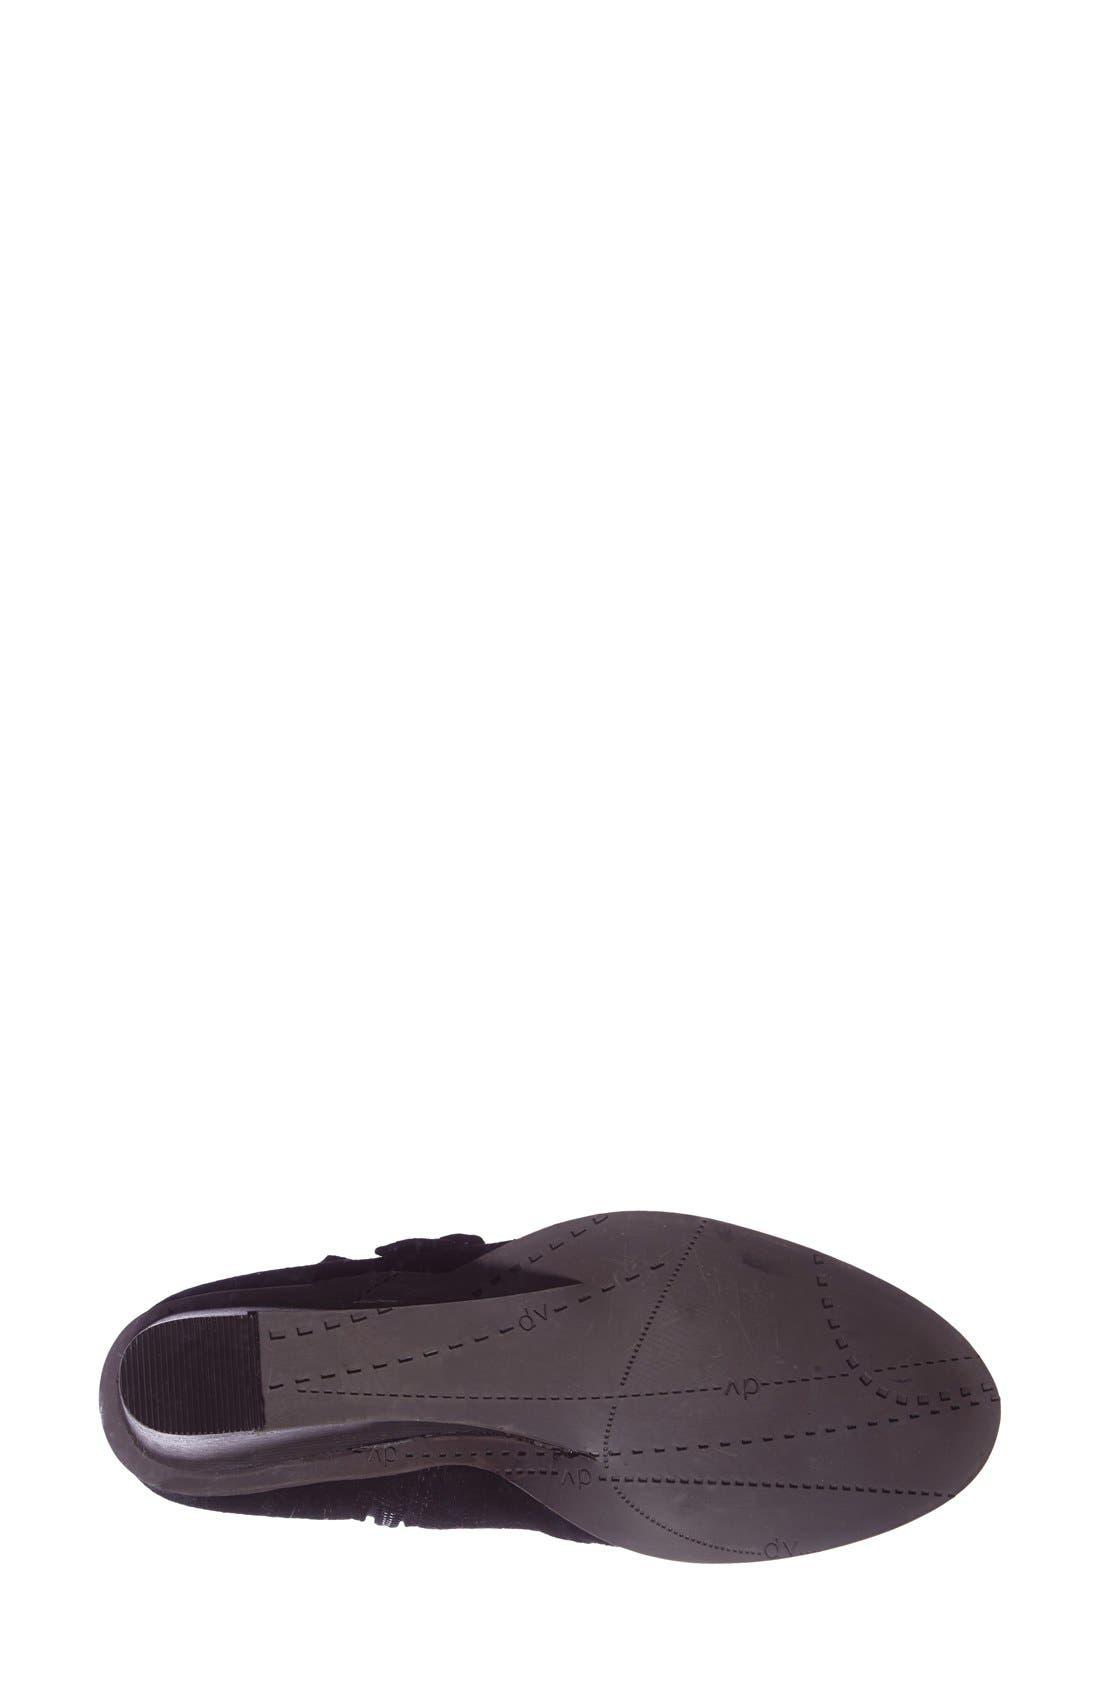 DV Footwear 'Fabian' Monk Strap Wedge Bootie,                             Alternate thumbnail 2, color,                             001